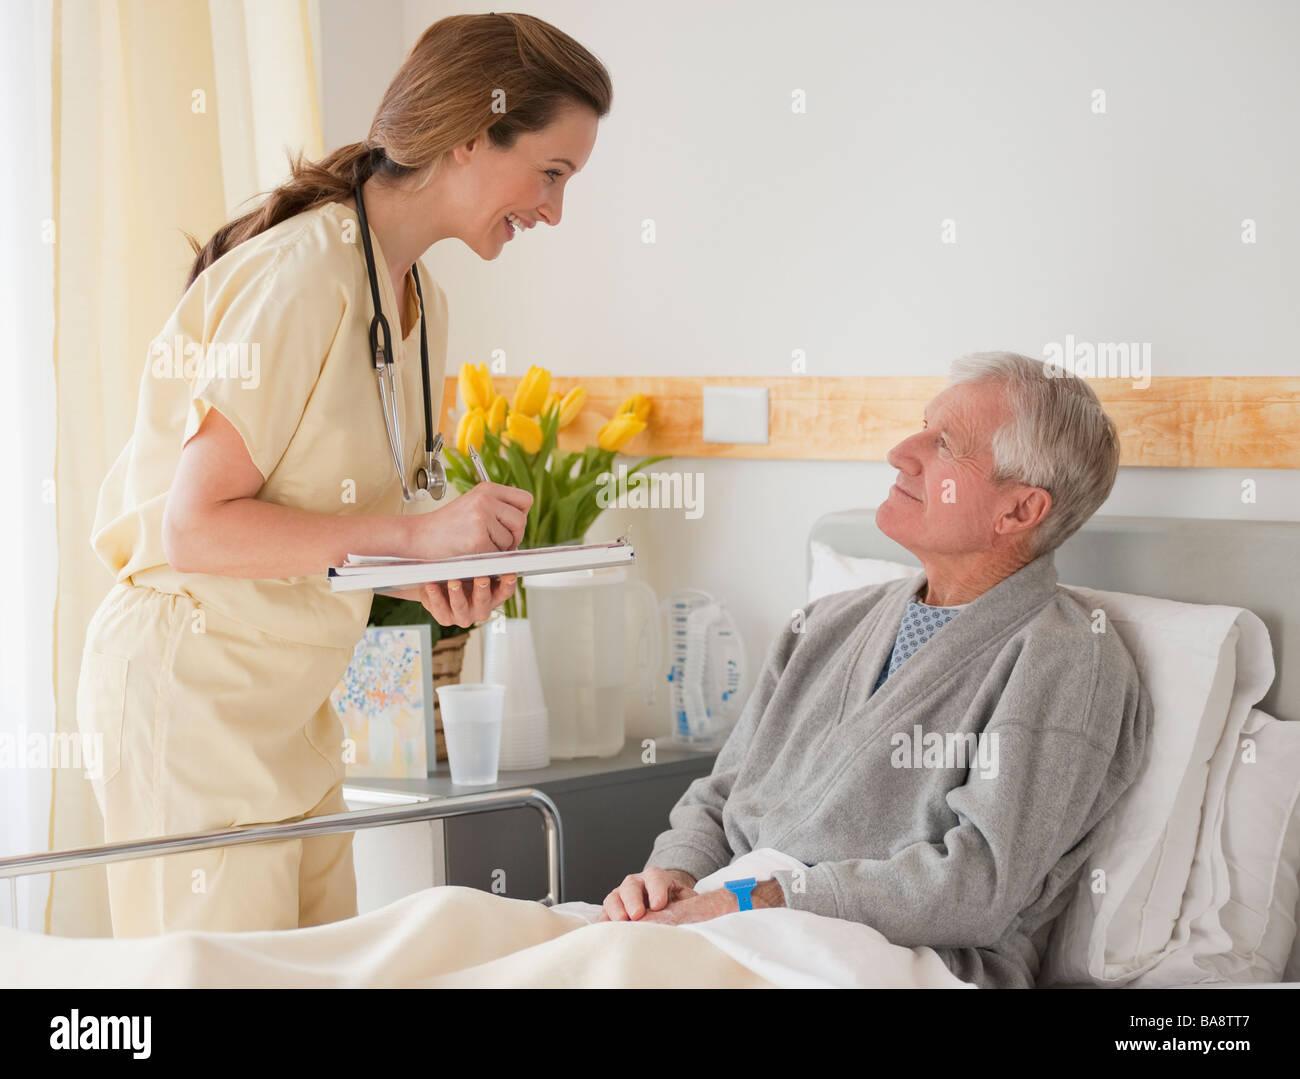 f rsorge f r ltere menschen im krankenhaus krankenschwester stockfoto bild 23552039 alamy. Black Bedroom Furniture Sets. Home Design Ideas